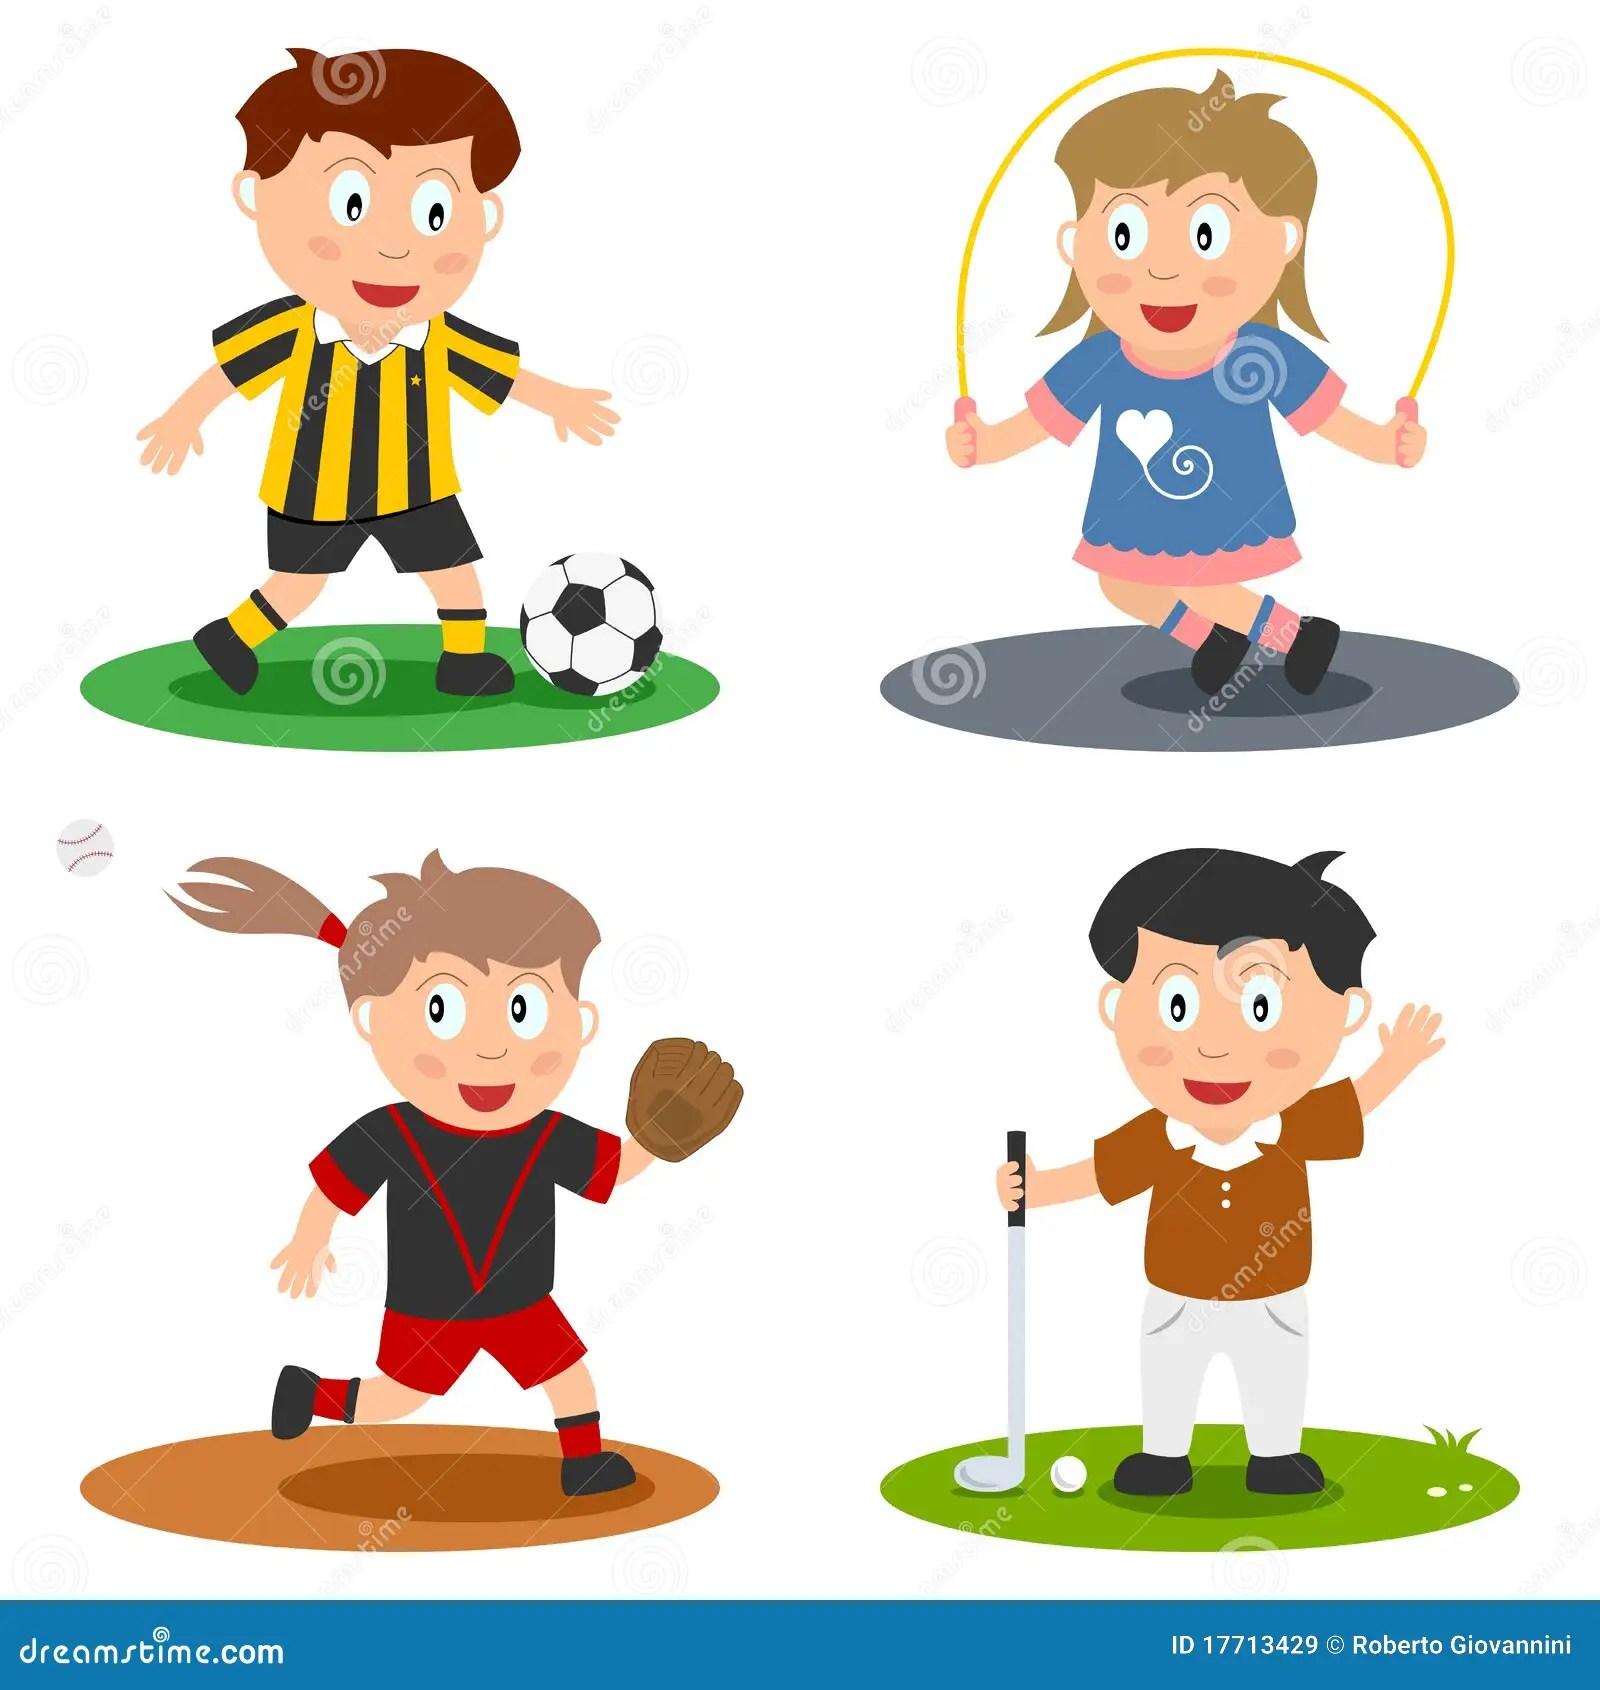 Softball Physical Education Worksheet